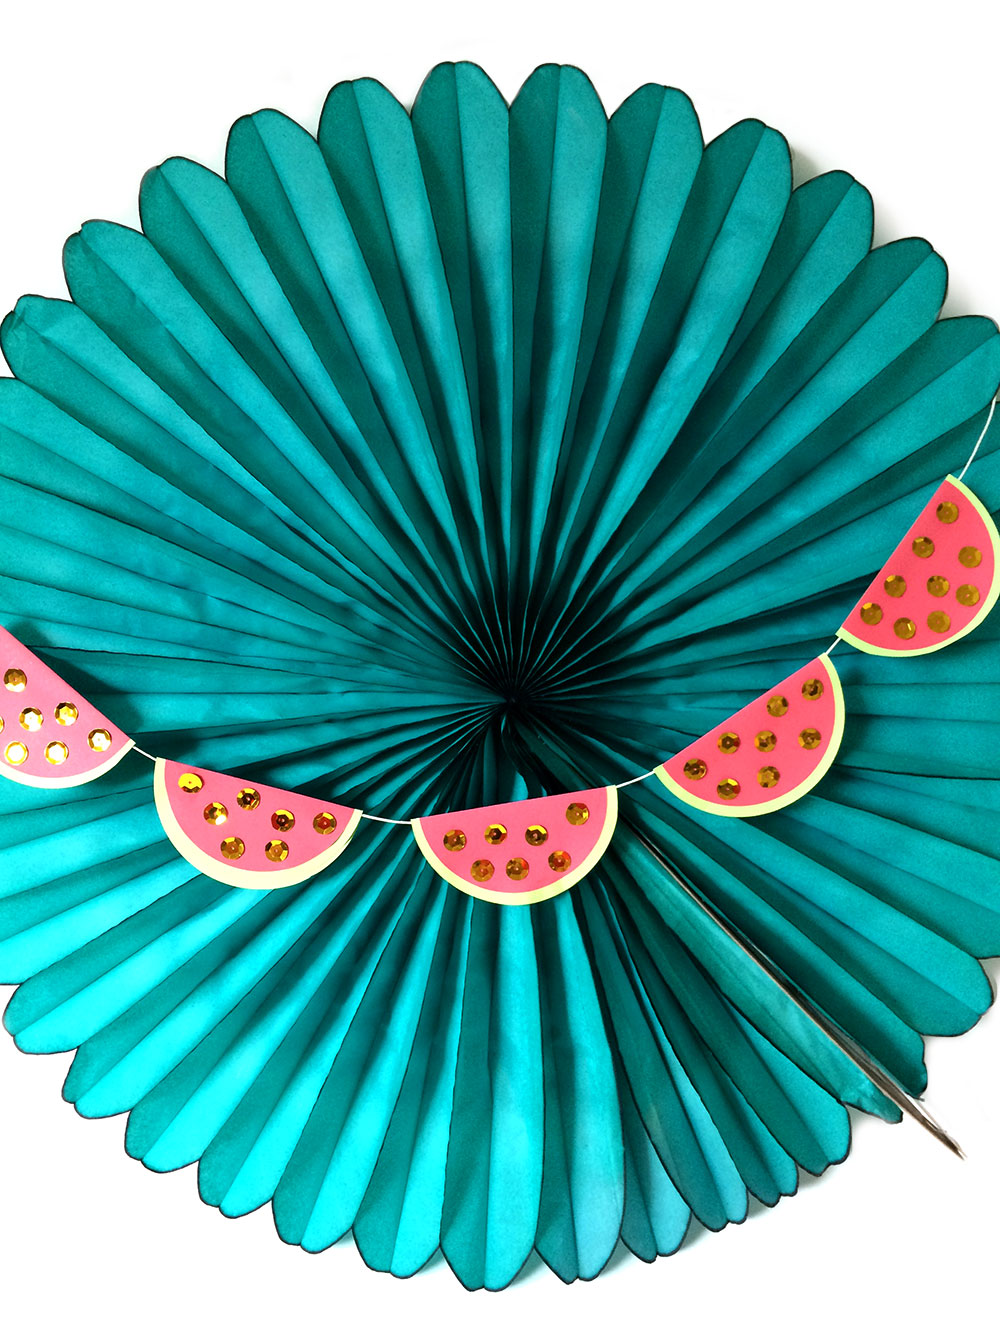 DIY watermelon garland with sequins